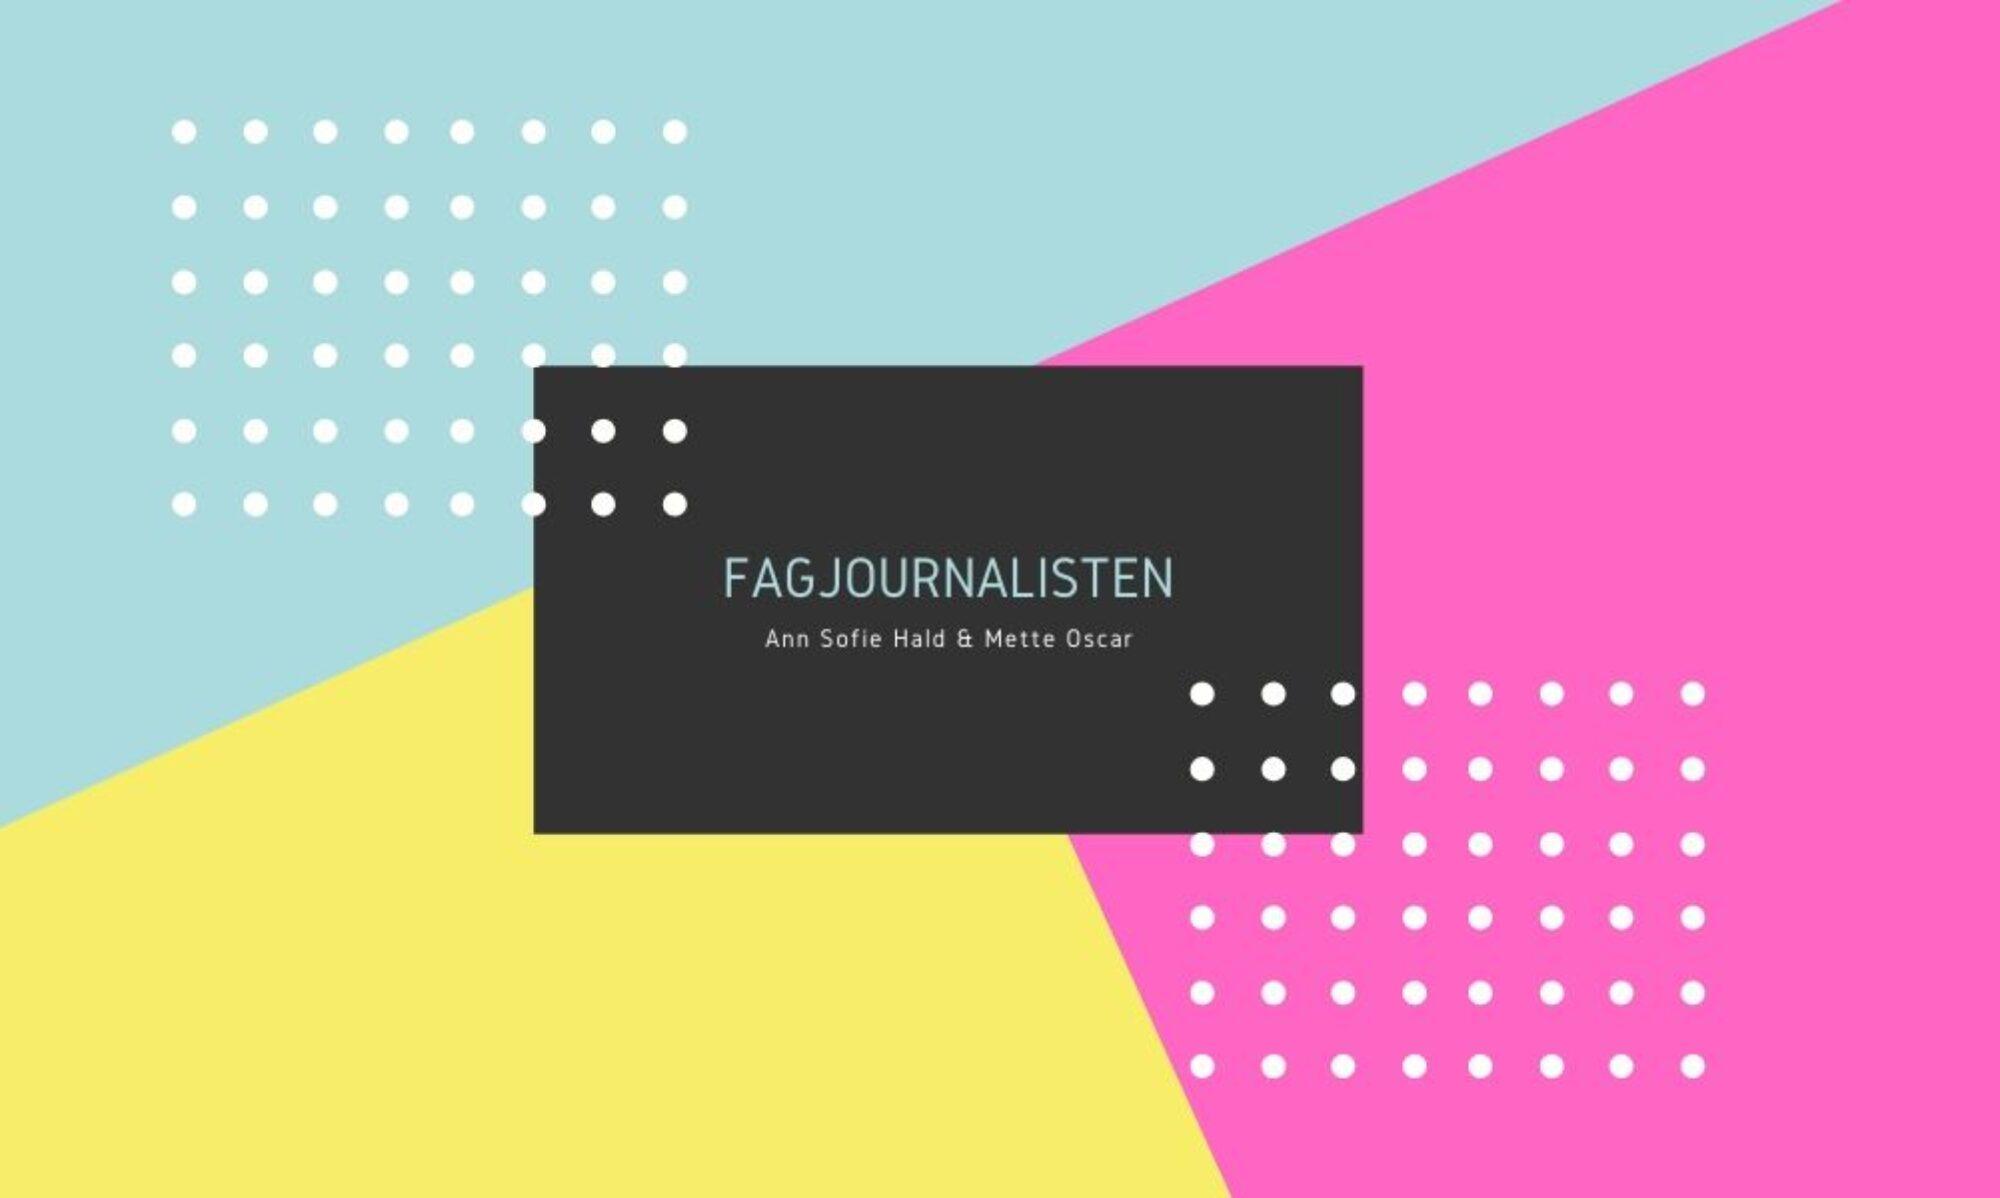 Fagjournalisten